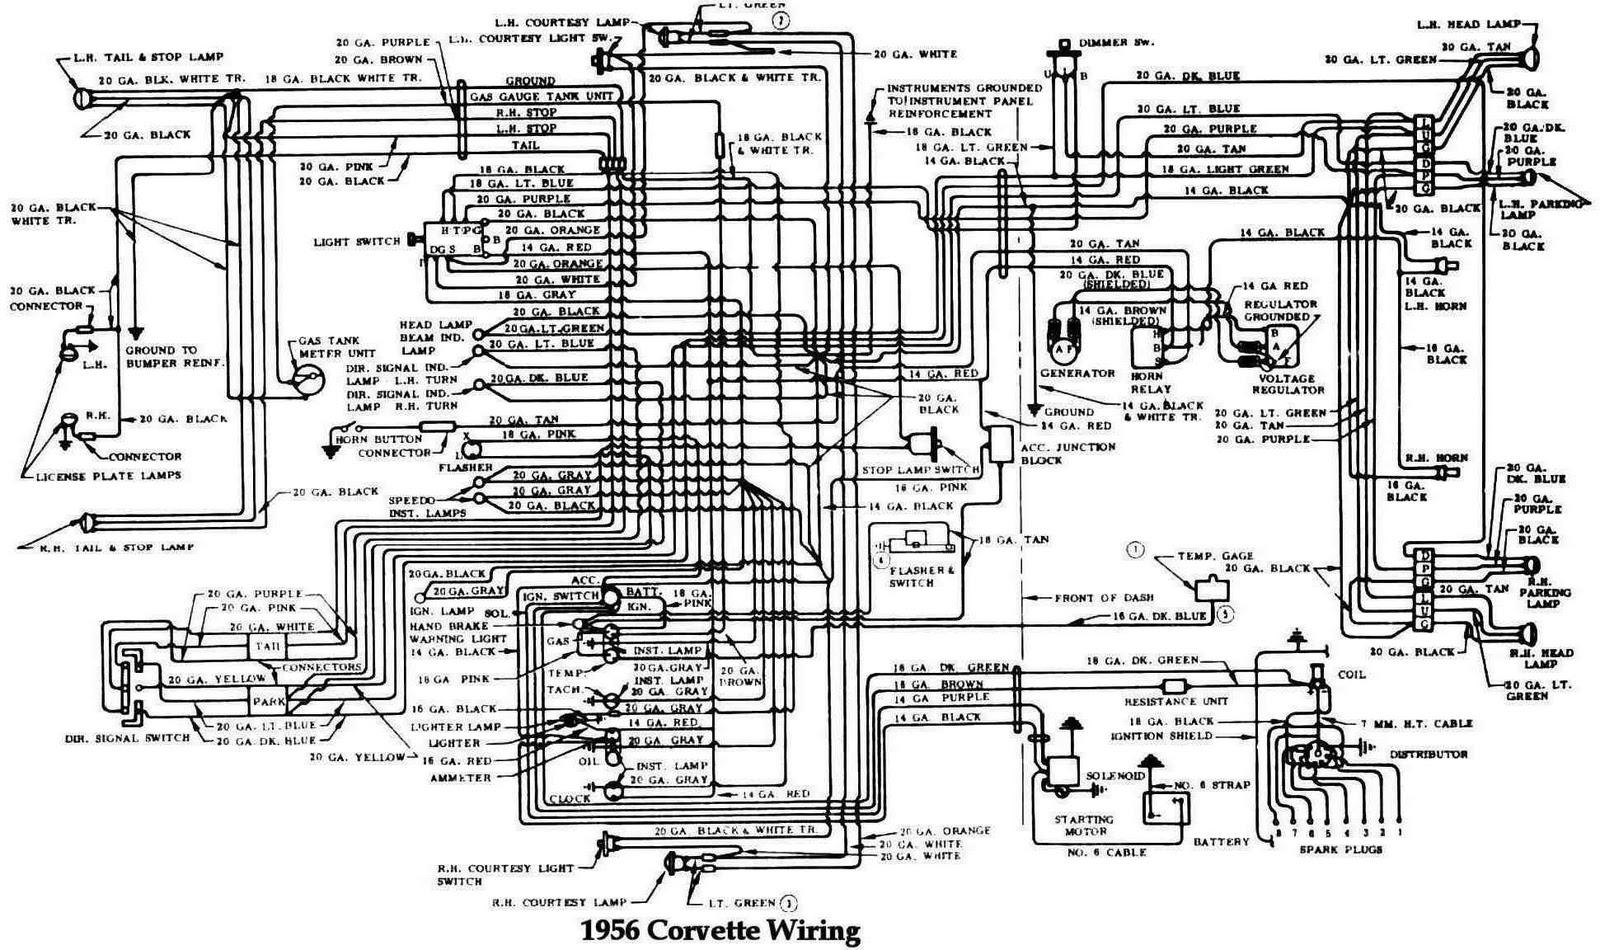 56 Mercury Wiring Diagram - Wiring Diagram Data Oreo - Mercury Outboard Wiring Diagram Schematic